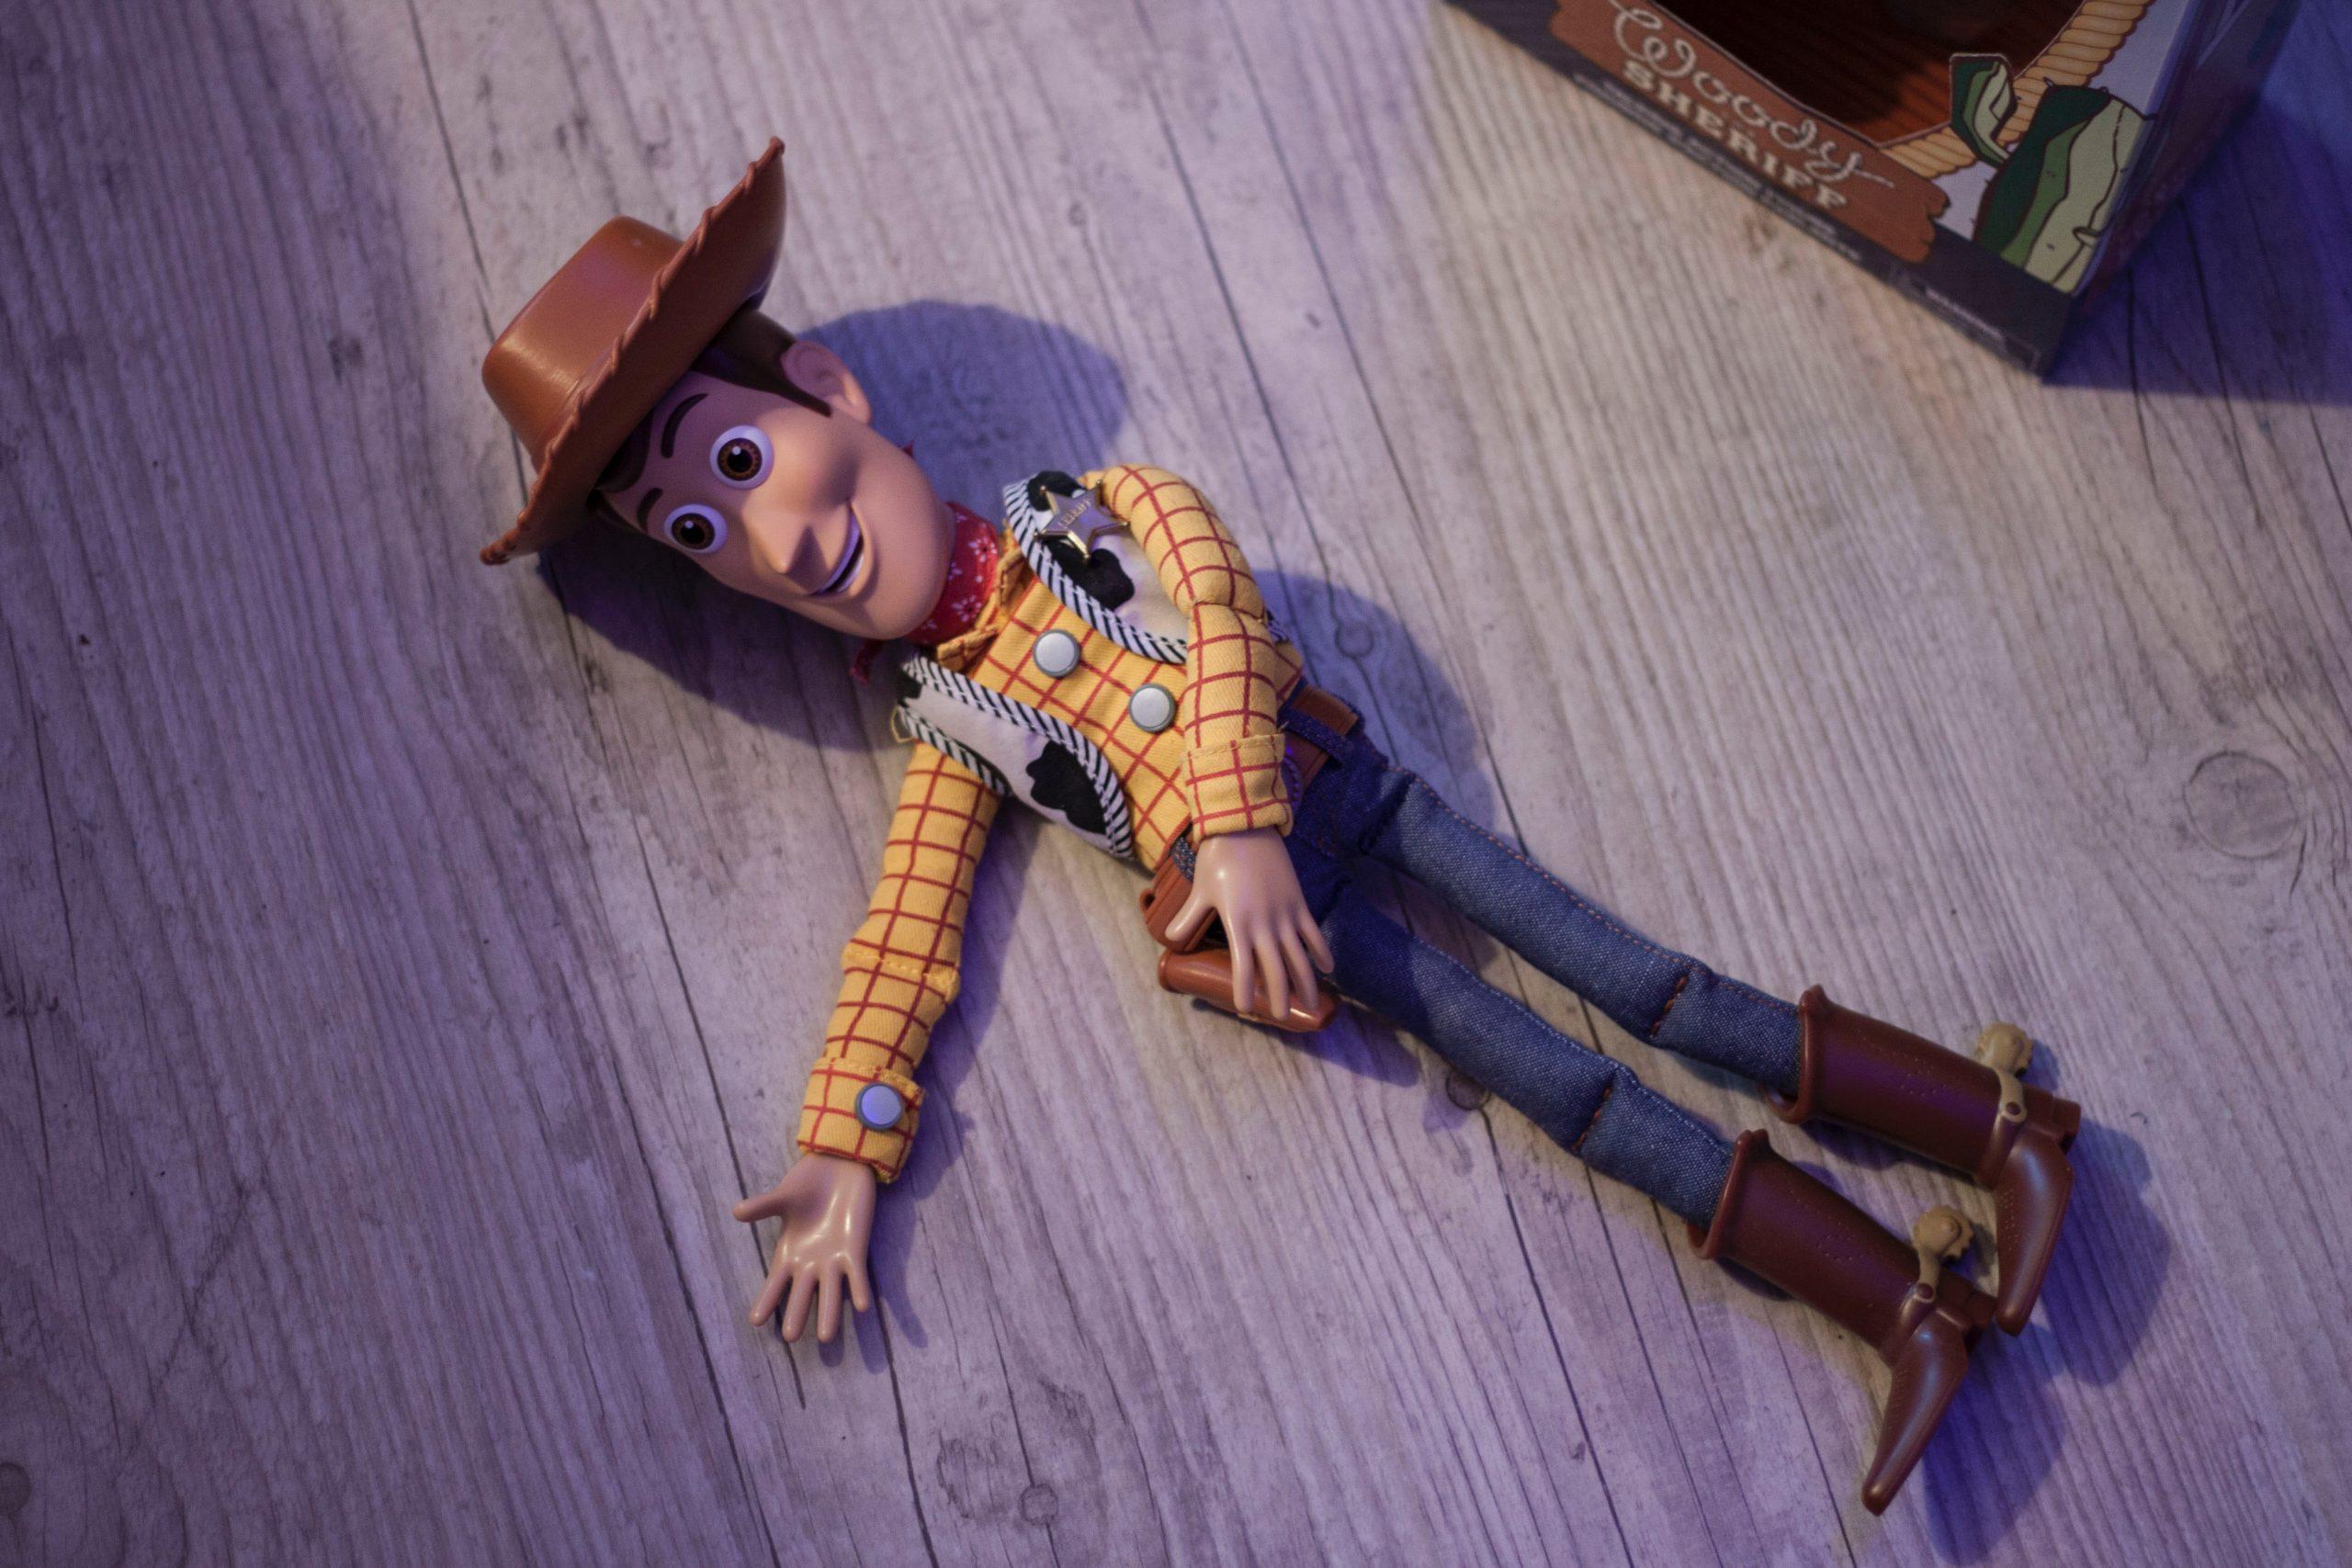 Woody, personagem da Pixar